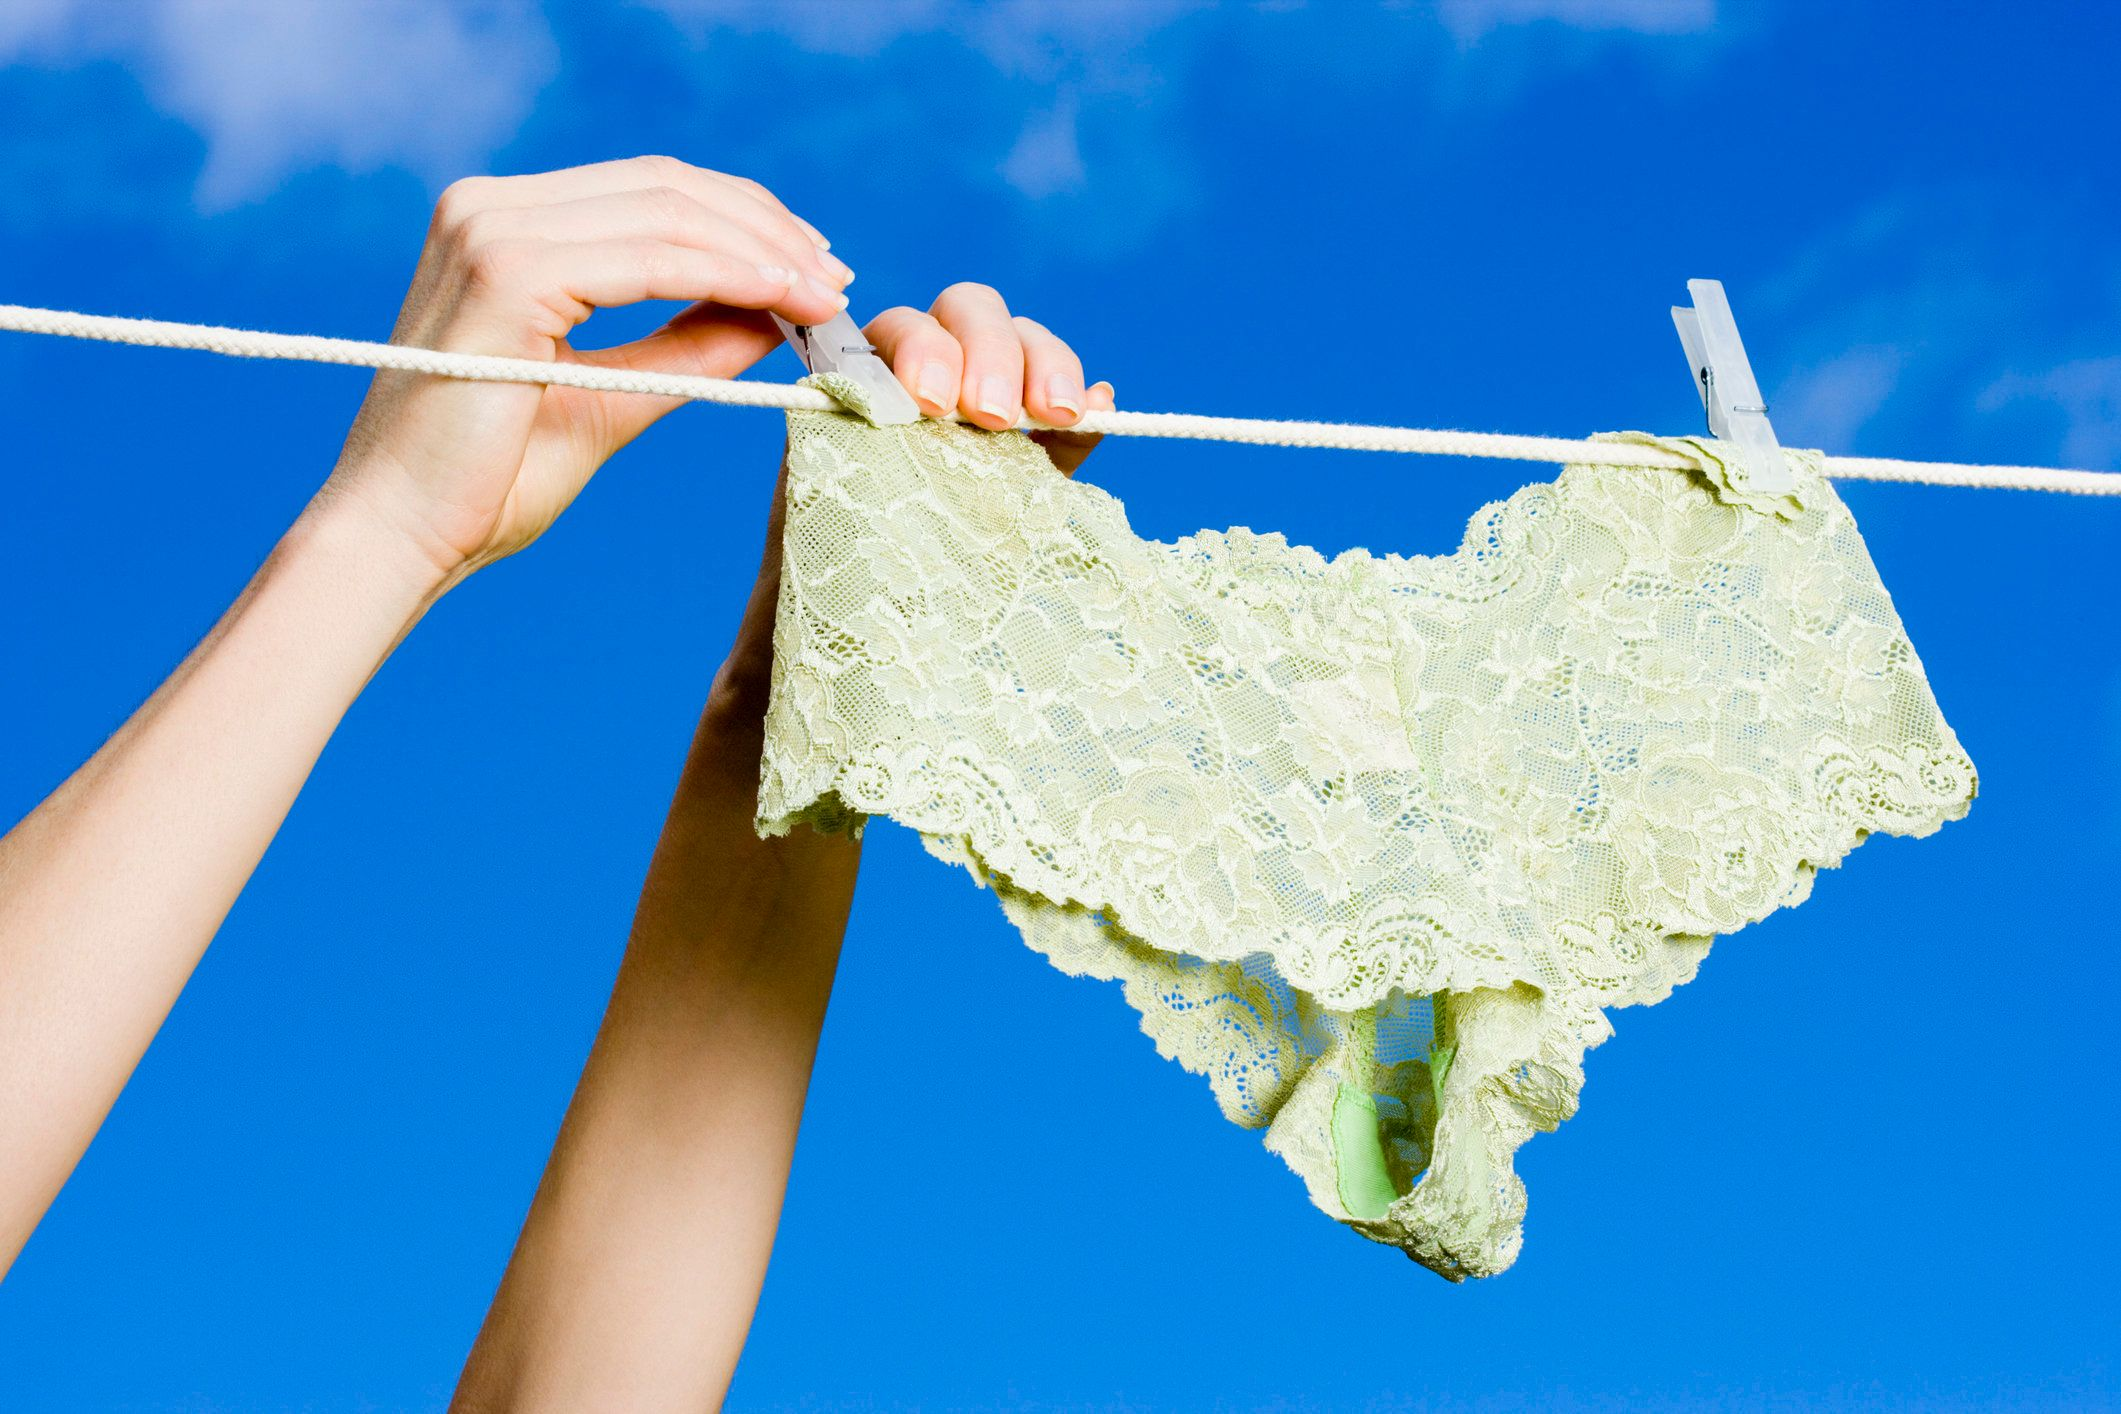 Hands hanging panties on clothesline